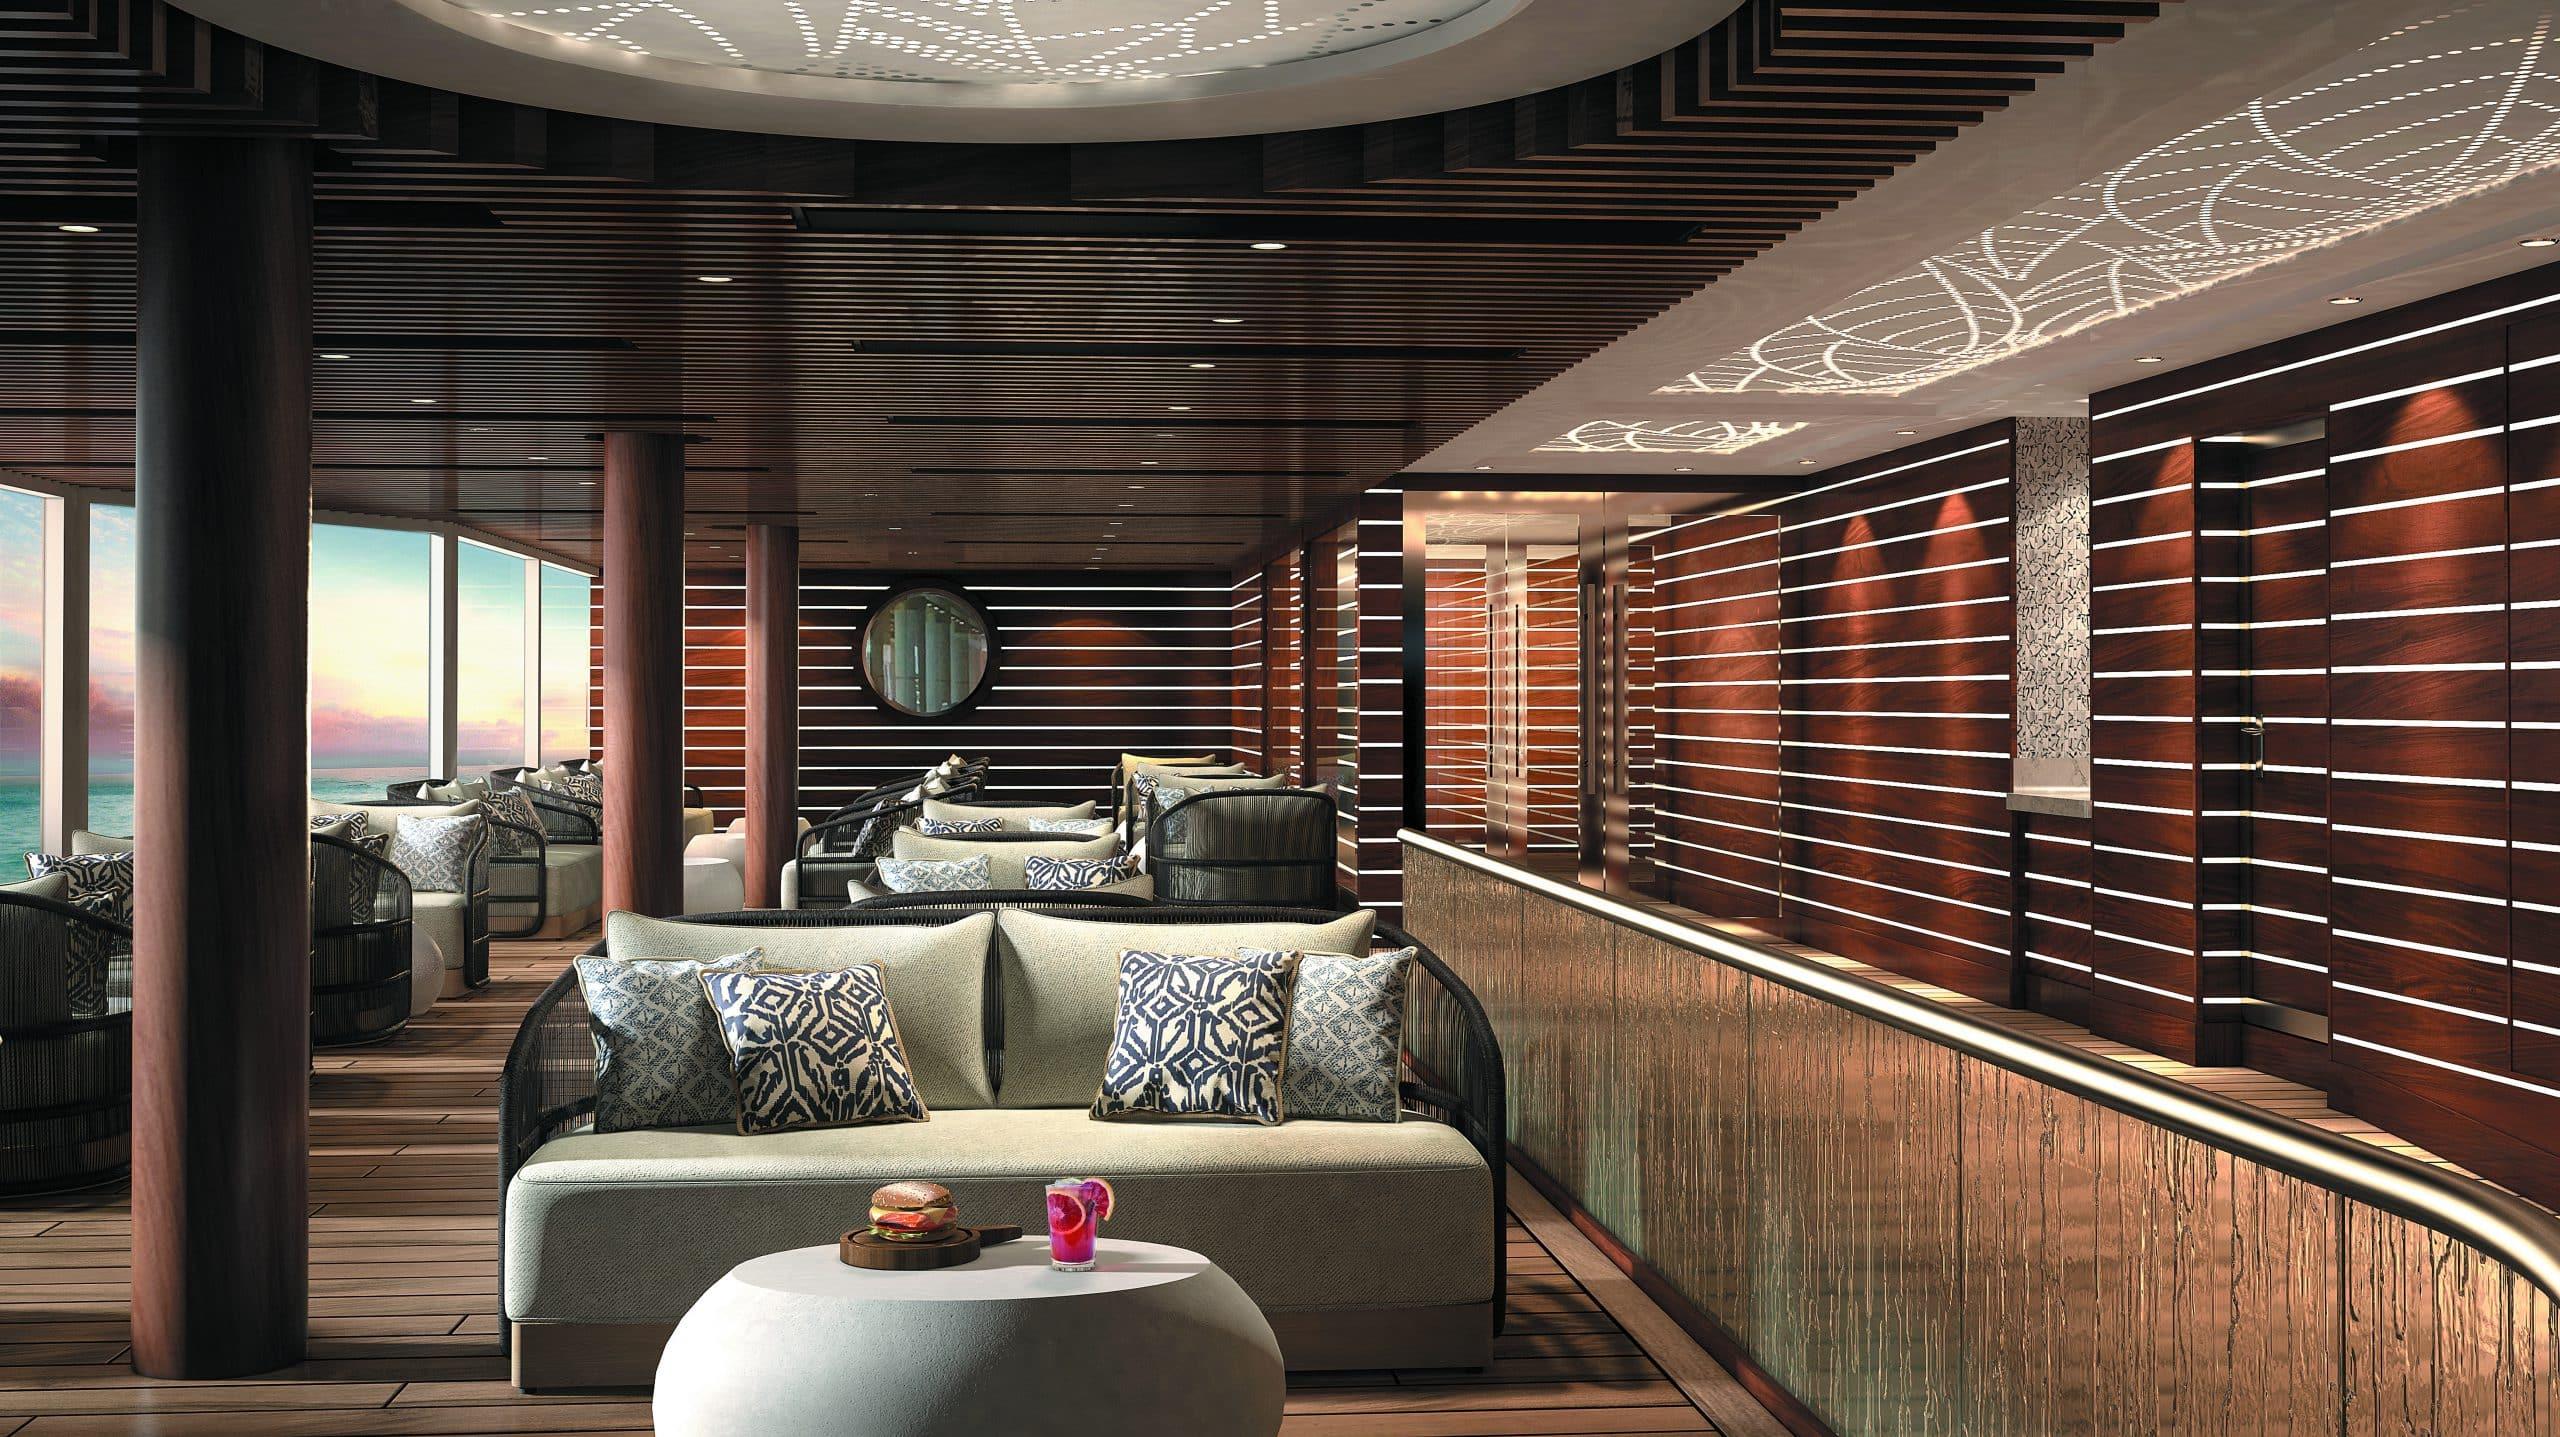 Regent Seven Seas Splendor Pool Deck - Grill Lounge